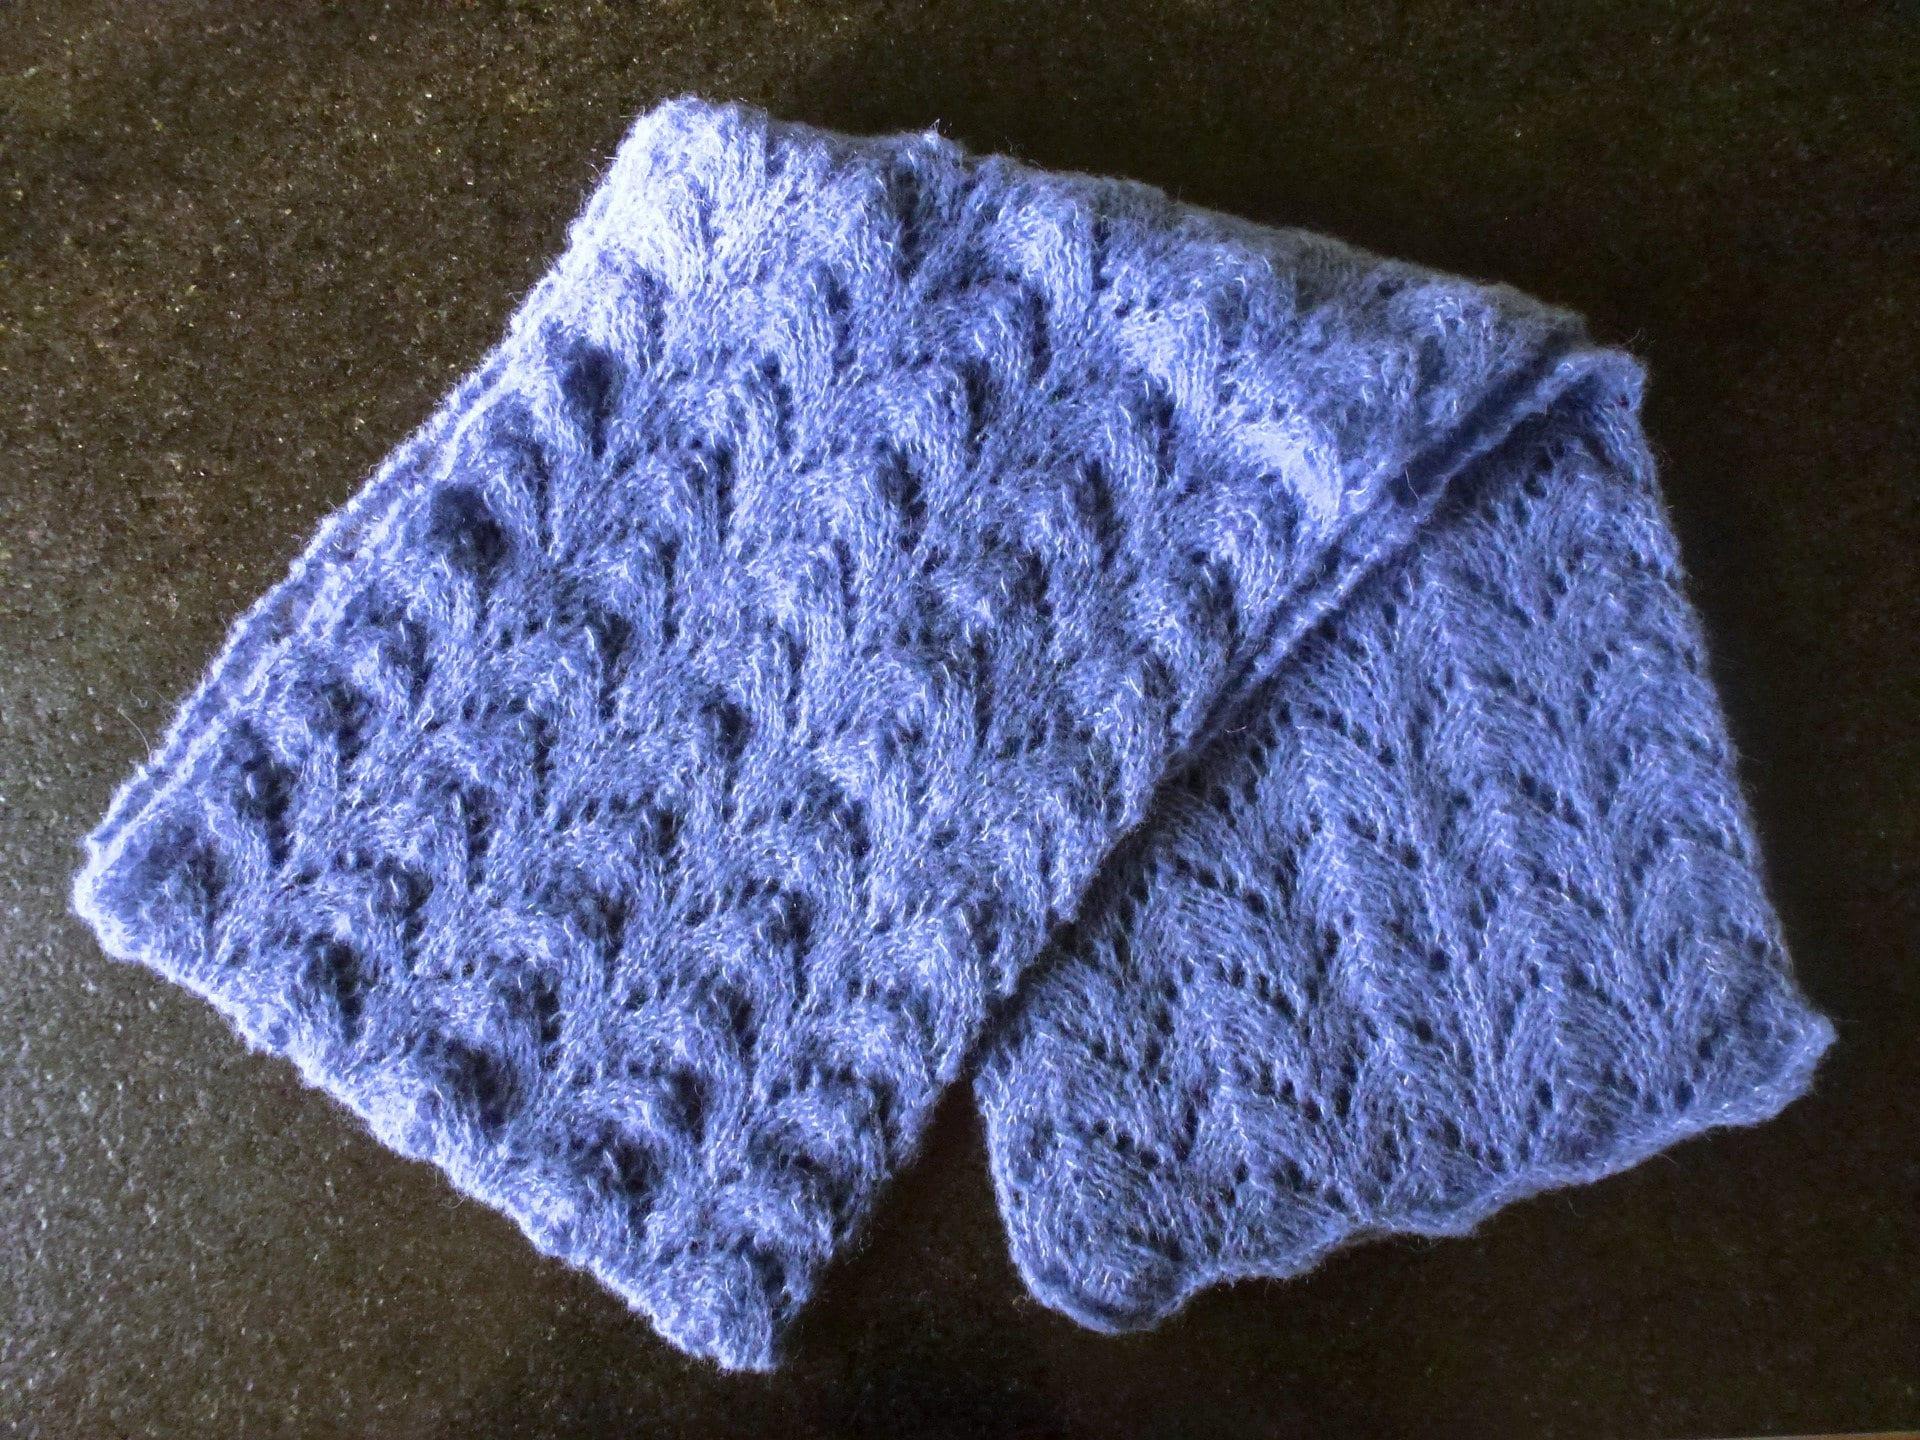 echarpe bleue jean alpaga soie point ajour zig zag en tricot. Black Bedroom Furniture Sets. Home Design Ideas